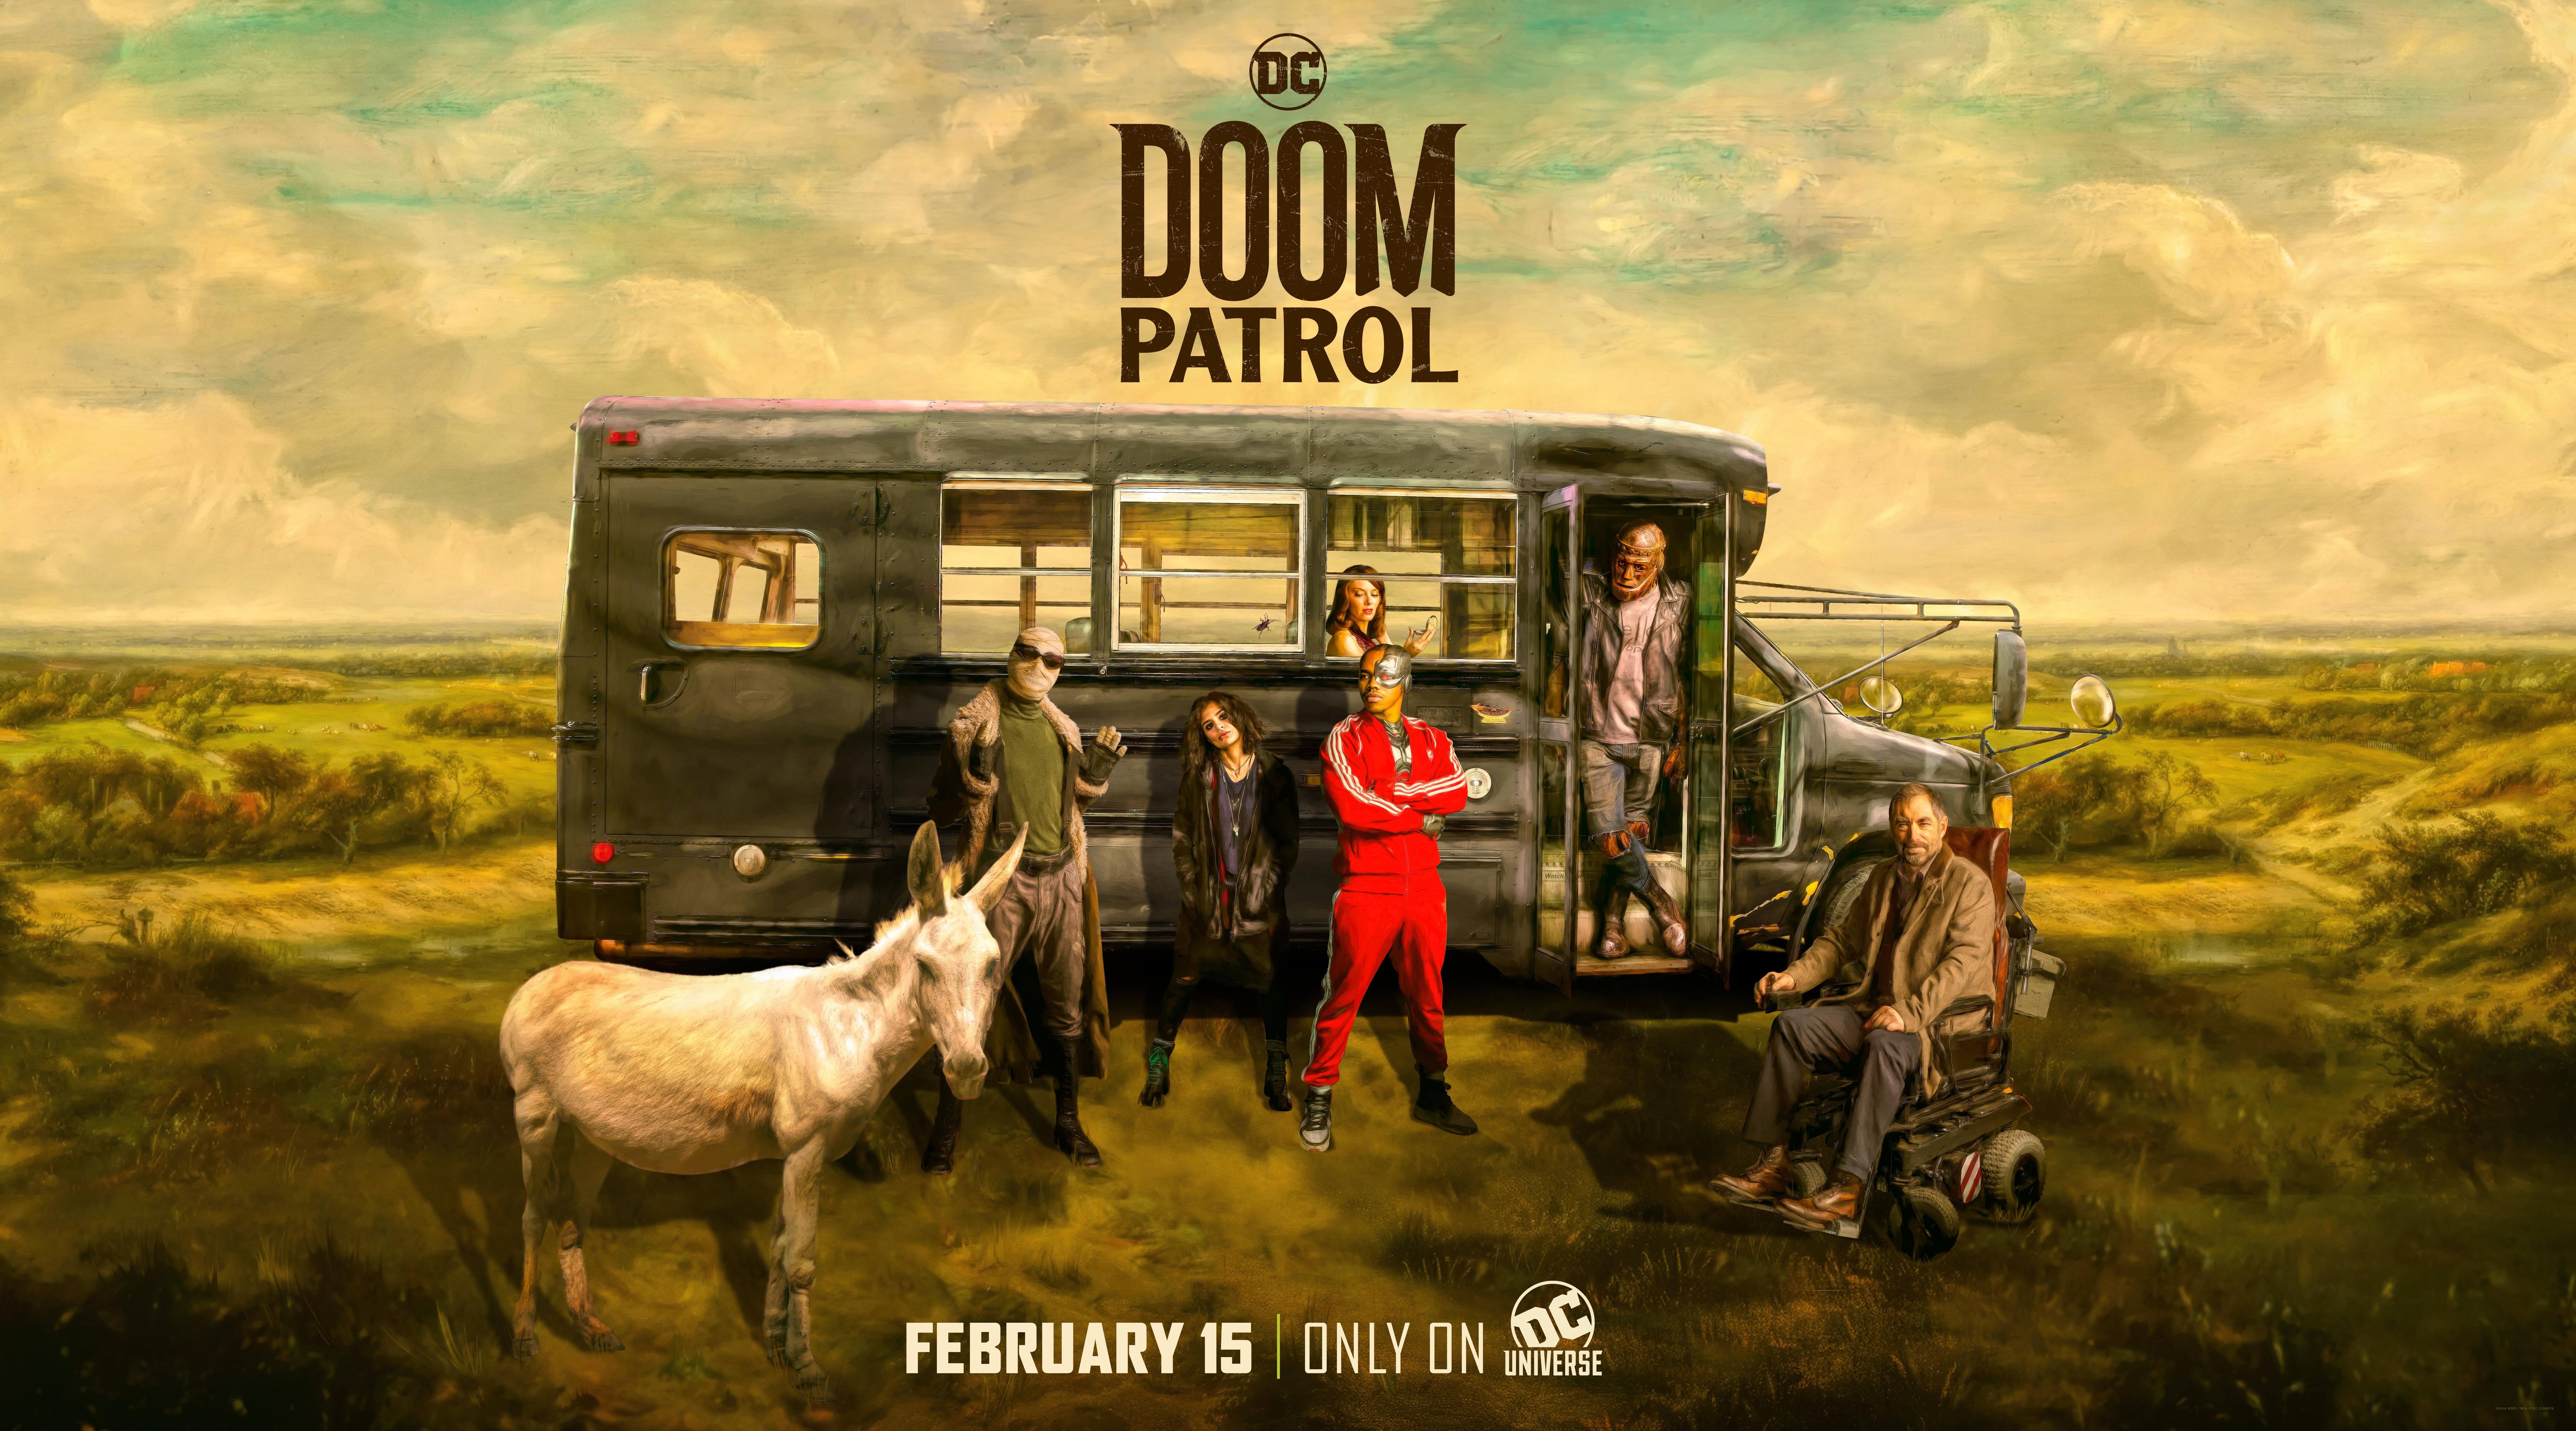 [News] DC UNIVERSE Offers FREE ACCESS to Pilot Doom Patrol Episode